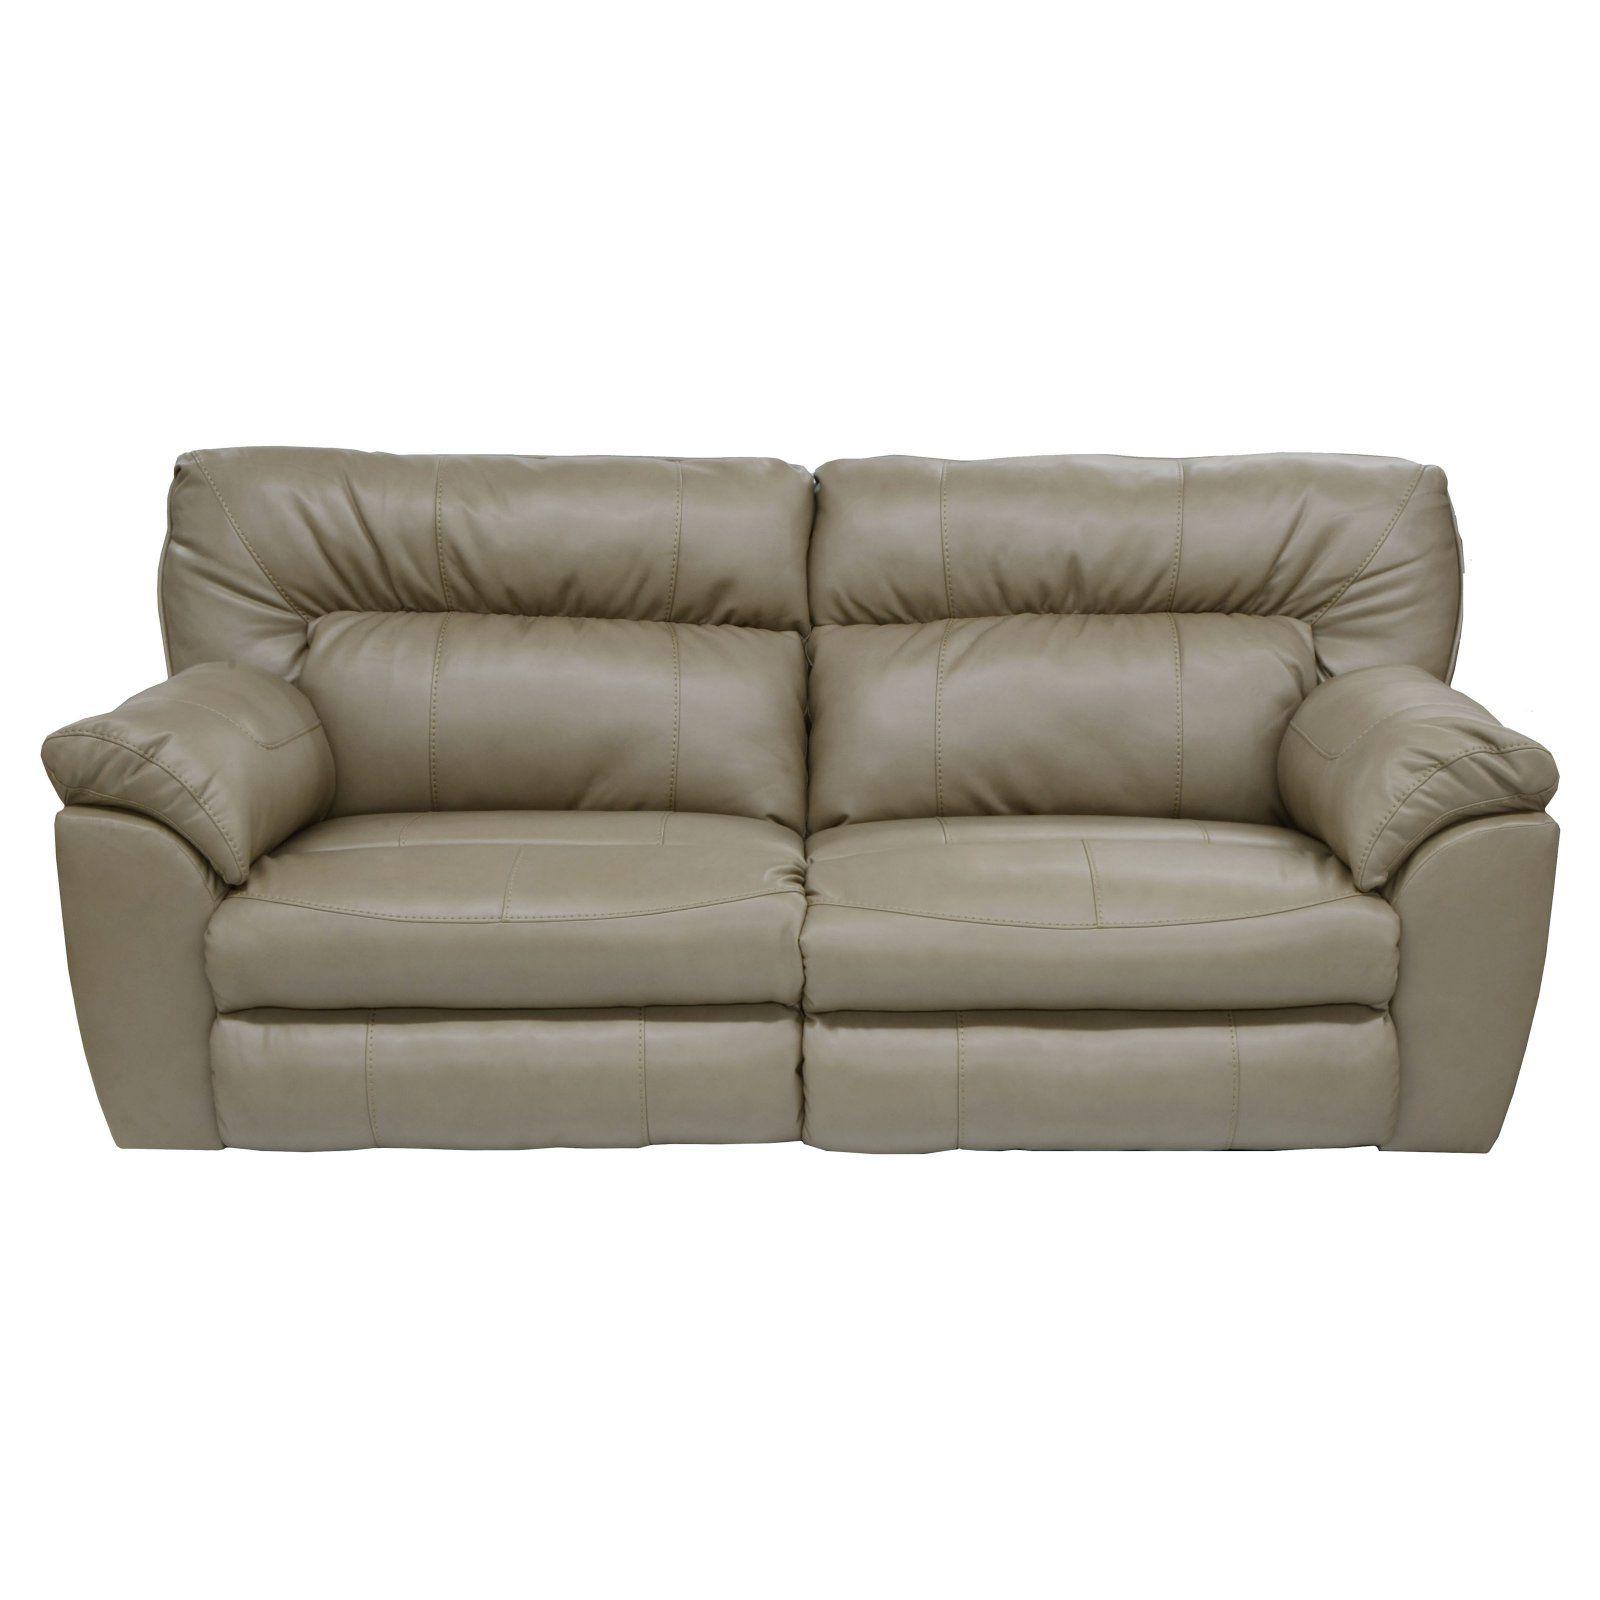 Fine Catnapper Nolan Extra Wide Reclining Sofa Putty Products Inzonedesignstudio Interior Chair Design Inzonedesignstudiocom